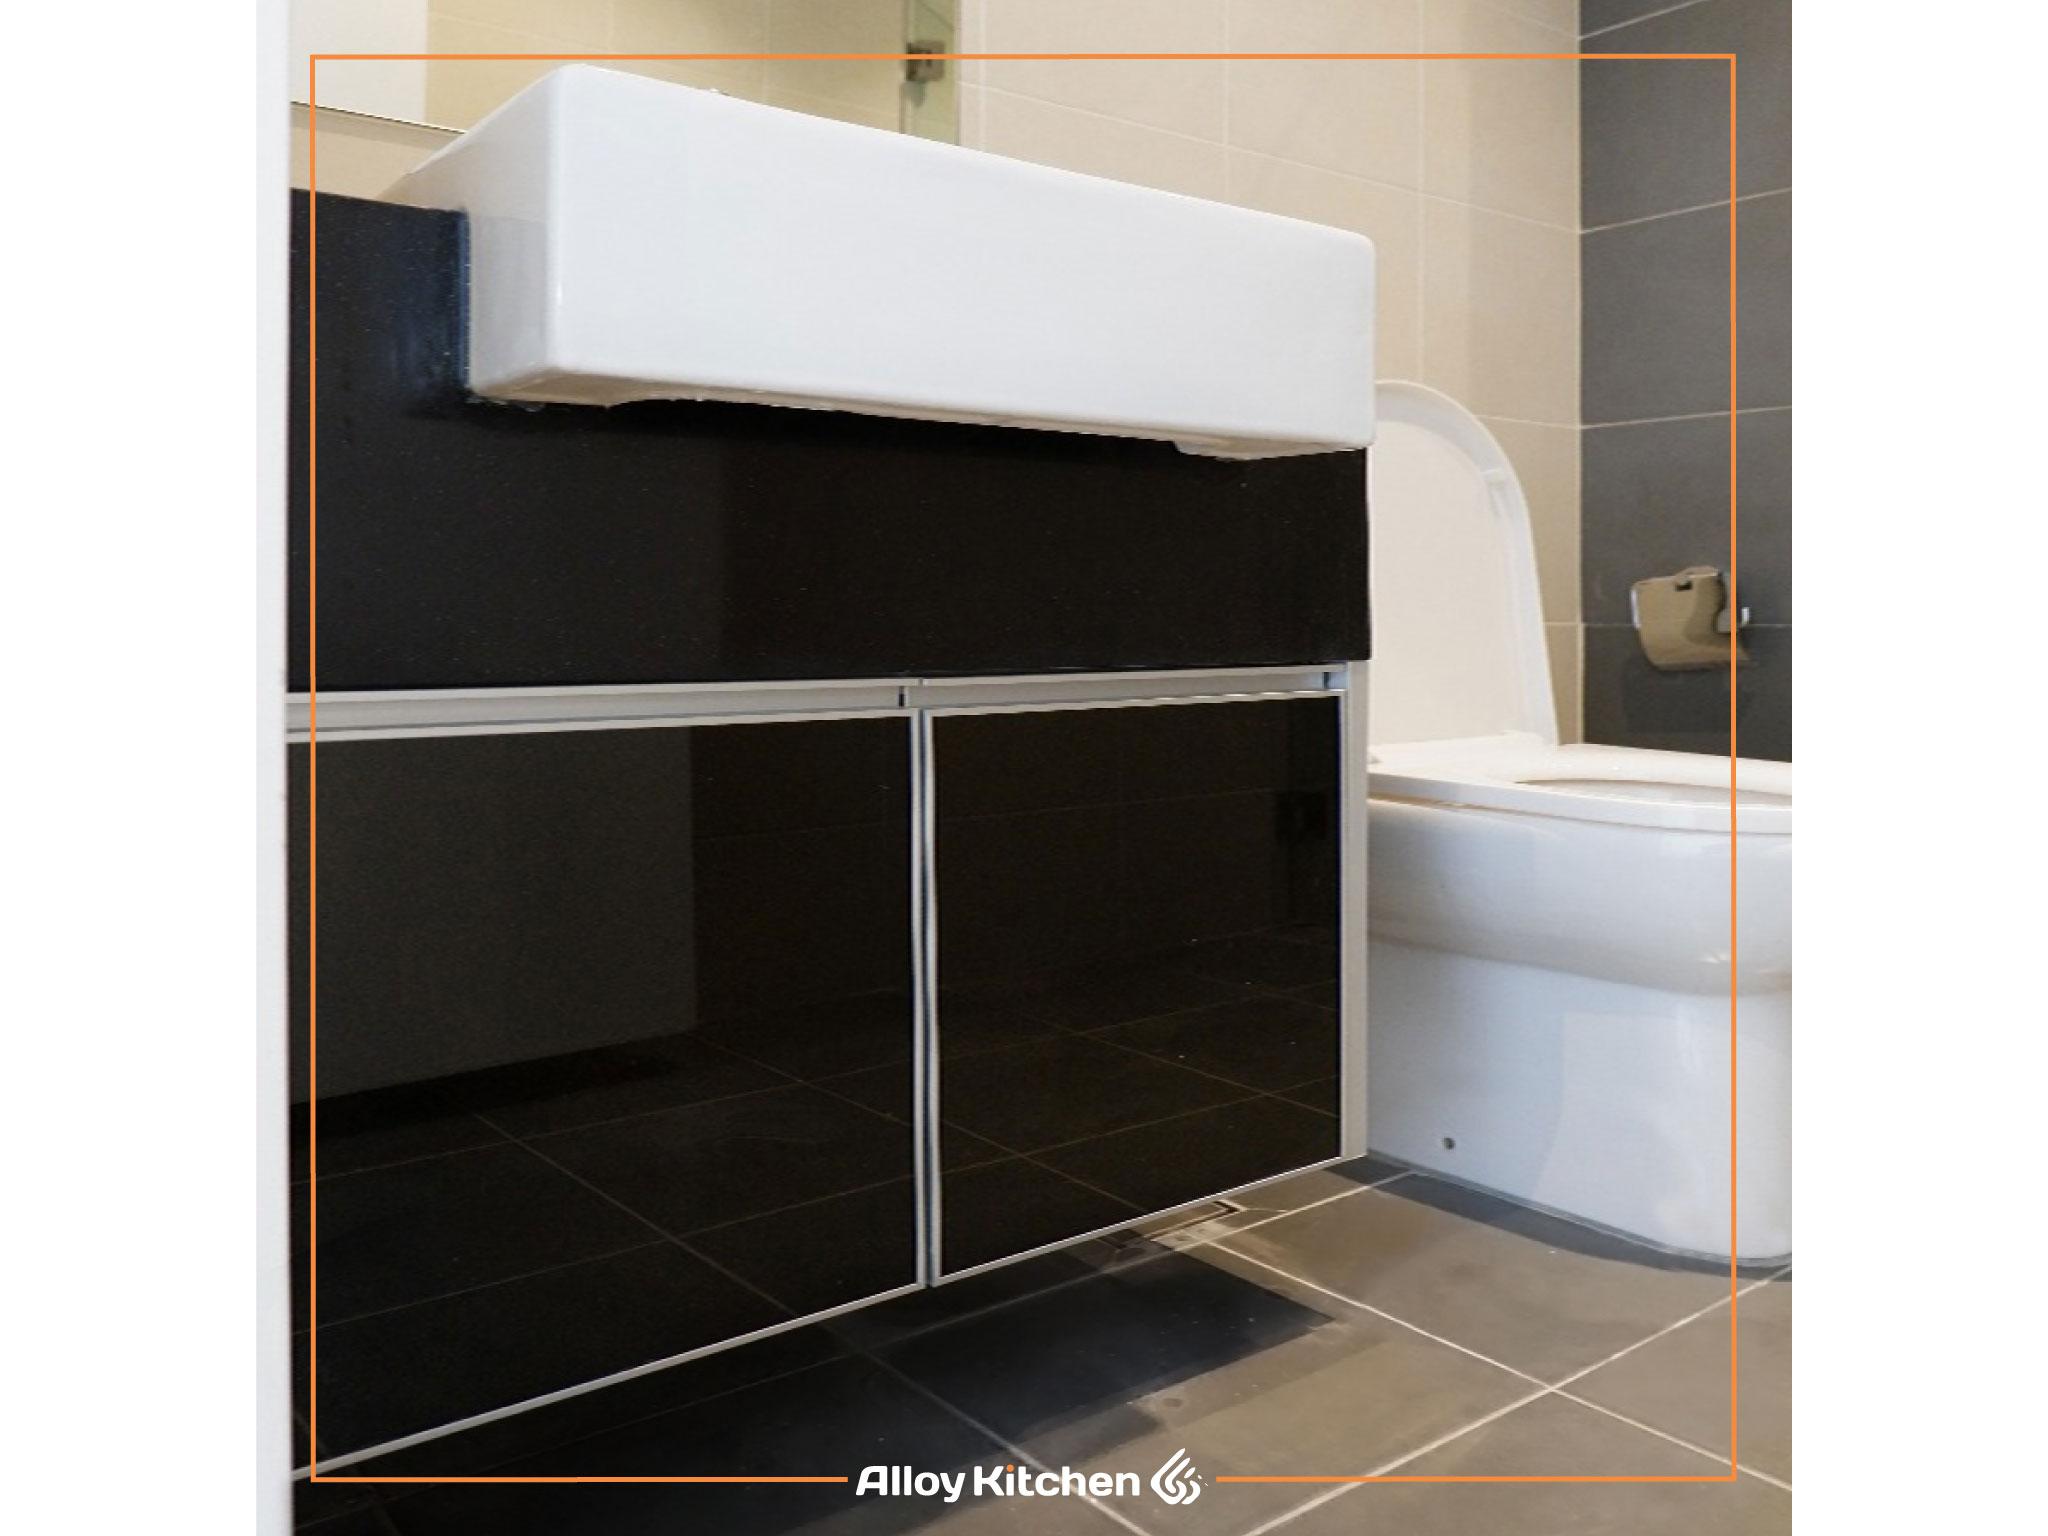 Alloy_Kitchen_Aluminium_Bathroom_Vanity / Alloy Kitchen Aluminium Bathroom Vanity Cabinet ACP